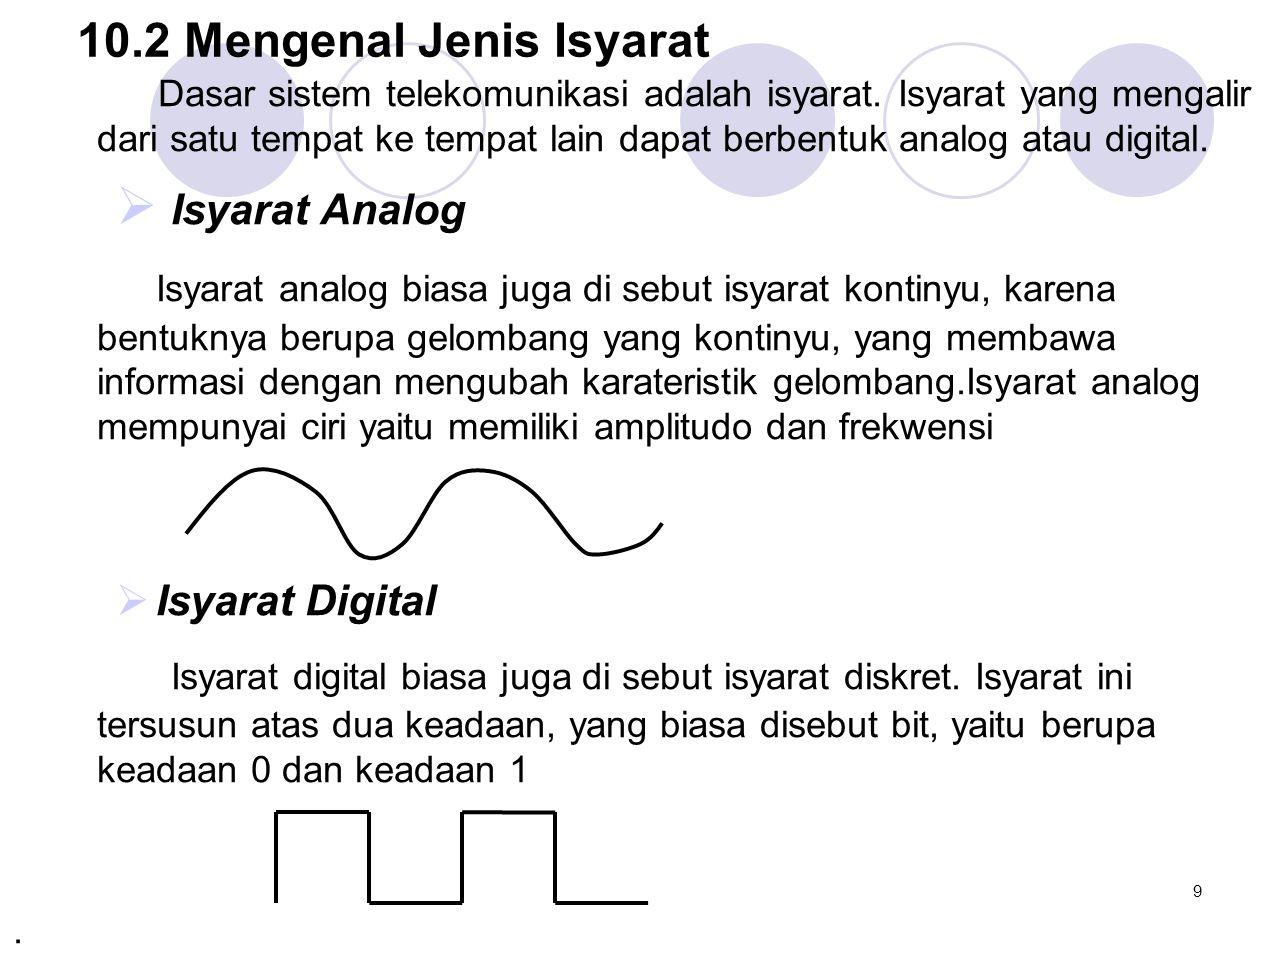 10.2 Mengenal Jenis Isyarat Dasar sistem telekomunikasi adalah isyarat. Isyarat yang mengalir dari satu tempat ke tempat lain dapat berbentuk analog a